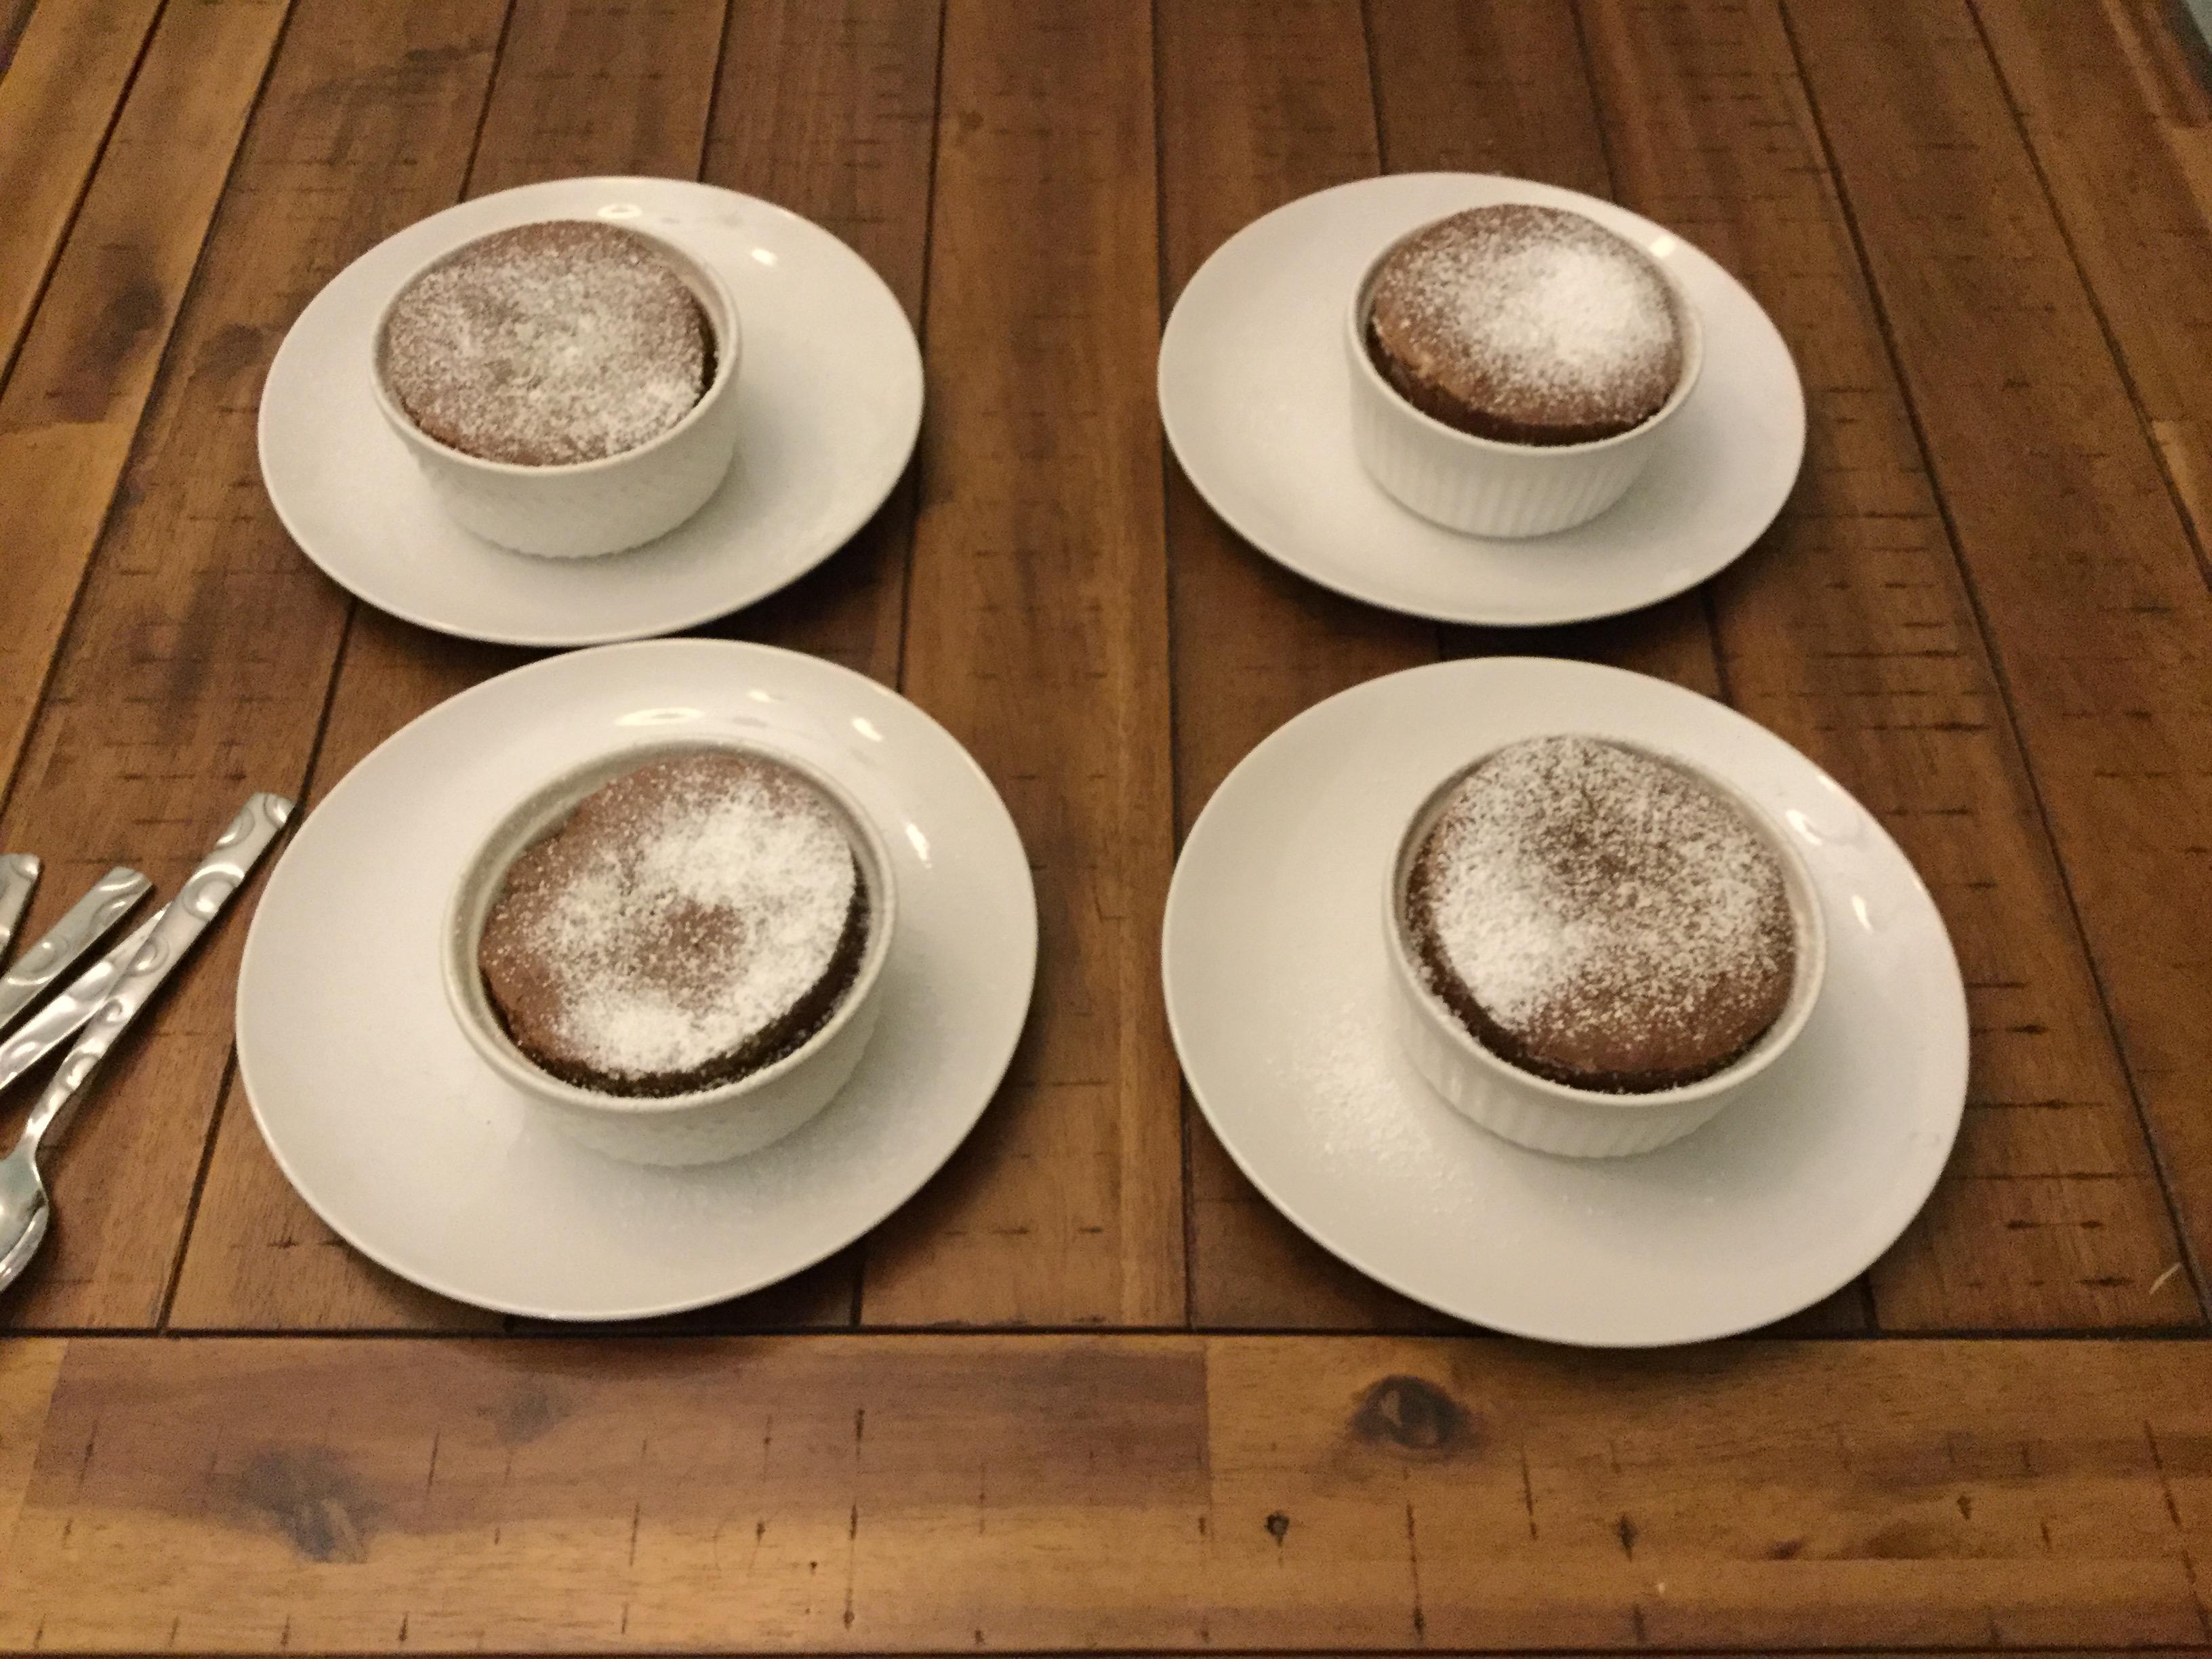 Chef John's Chocolate Souffle Meretia